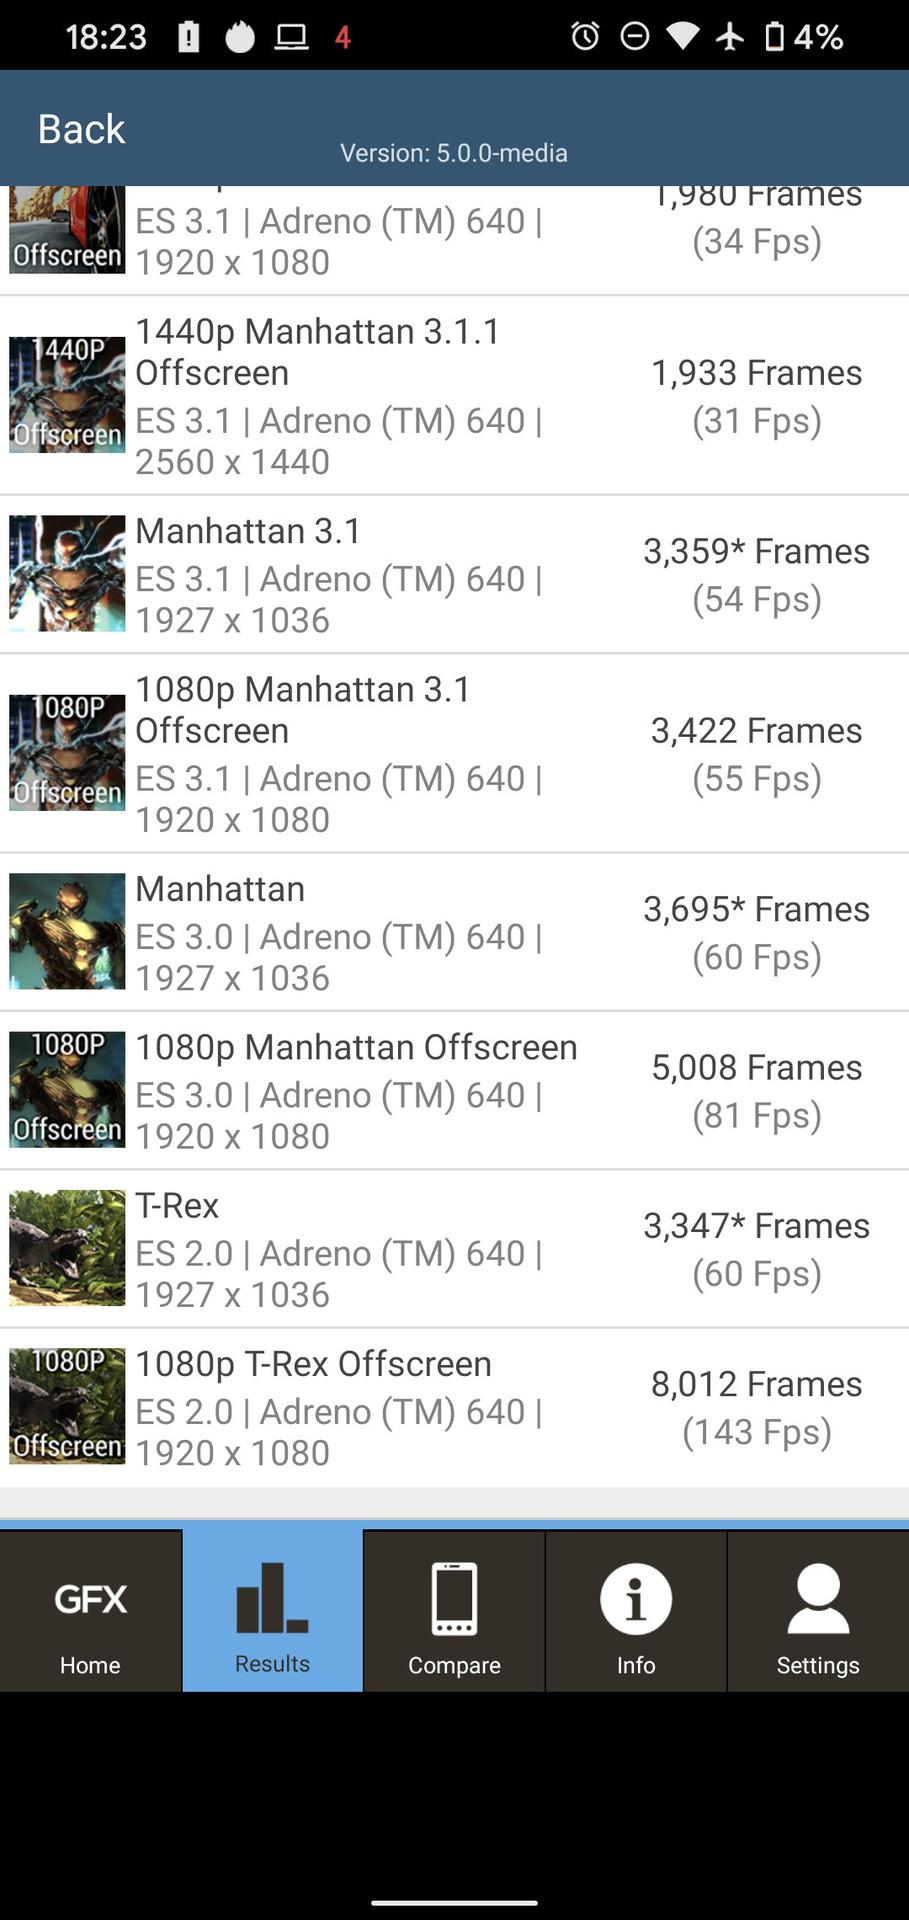 Google Pixel 4 GFXBench benchmark results